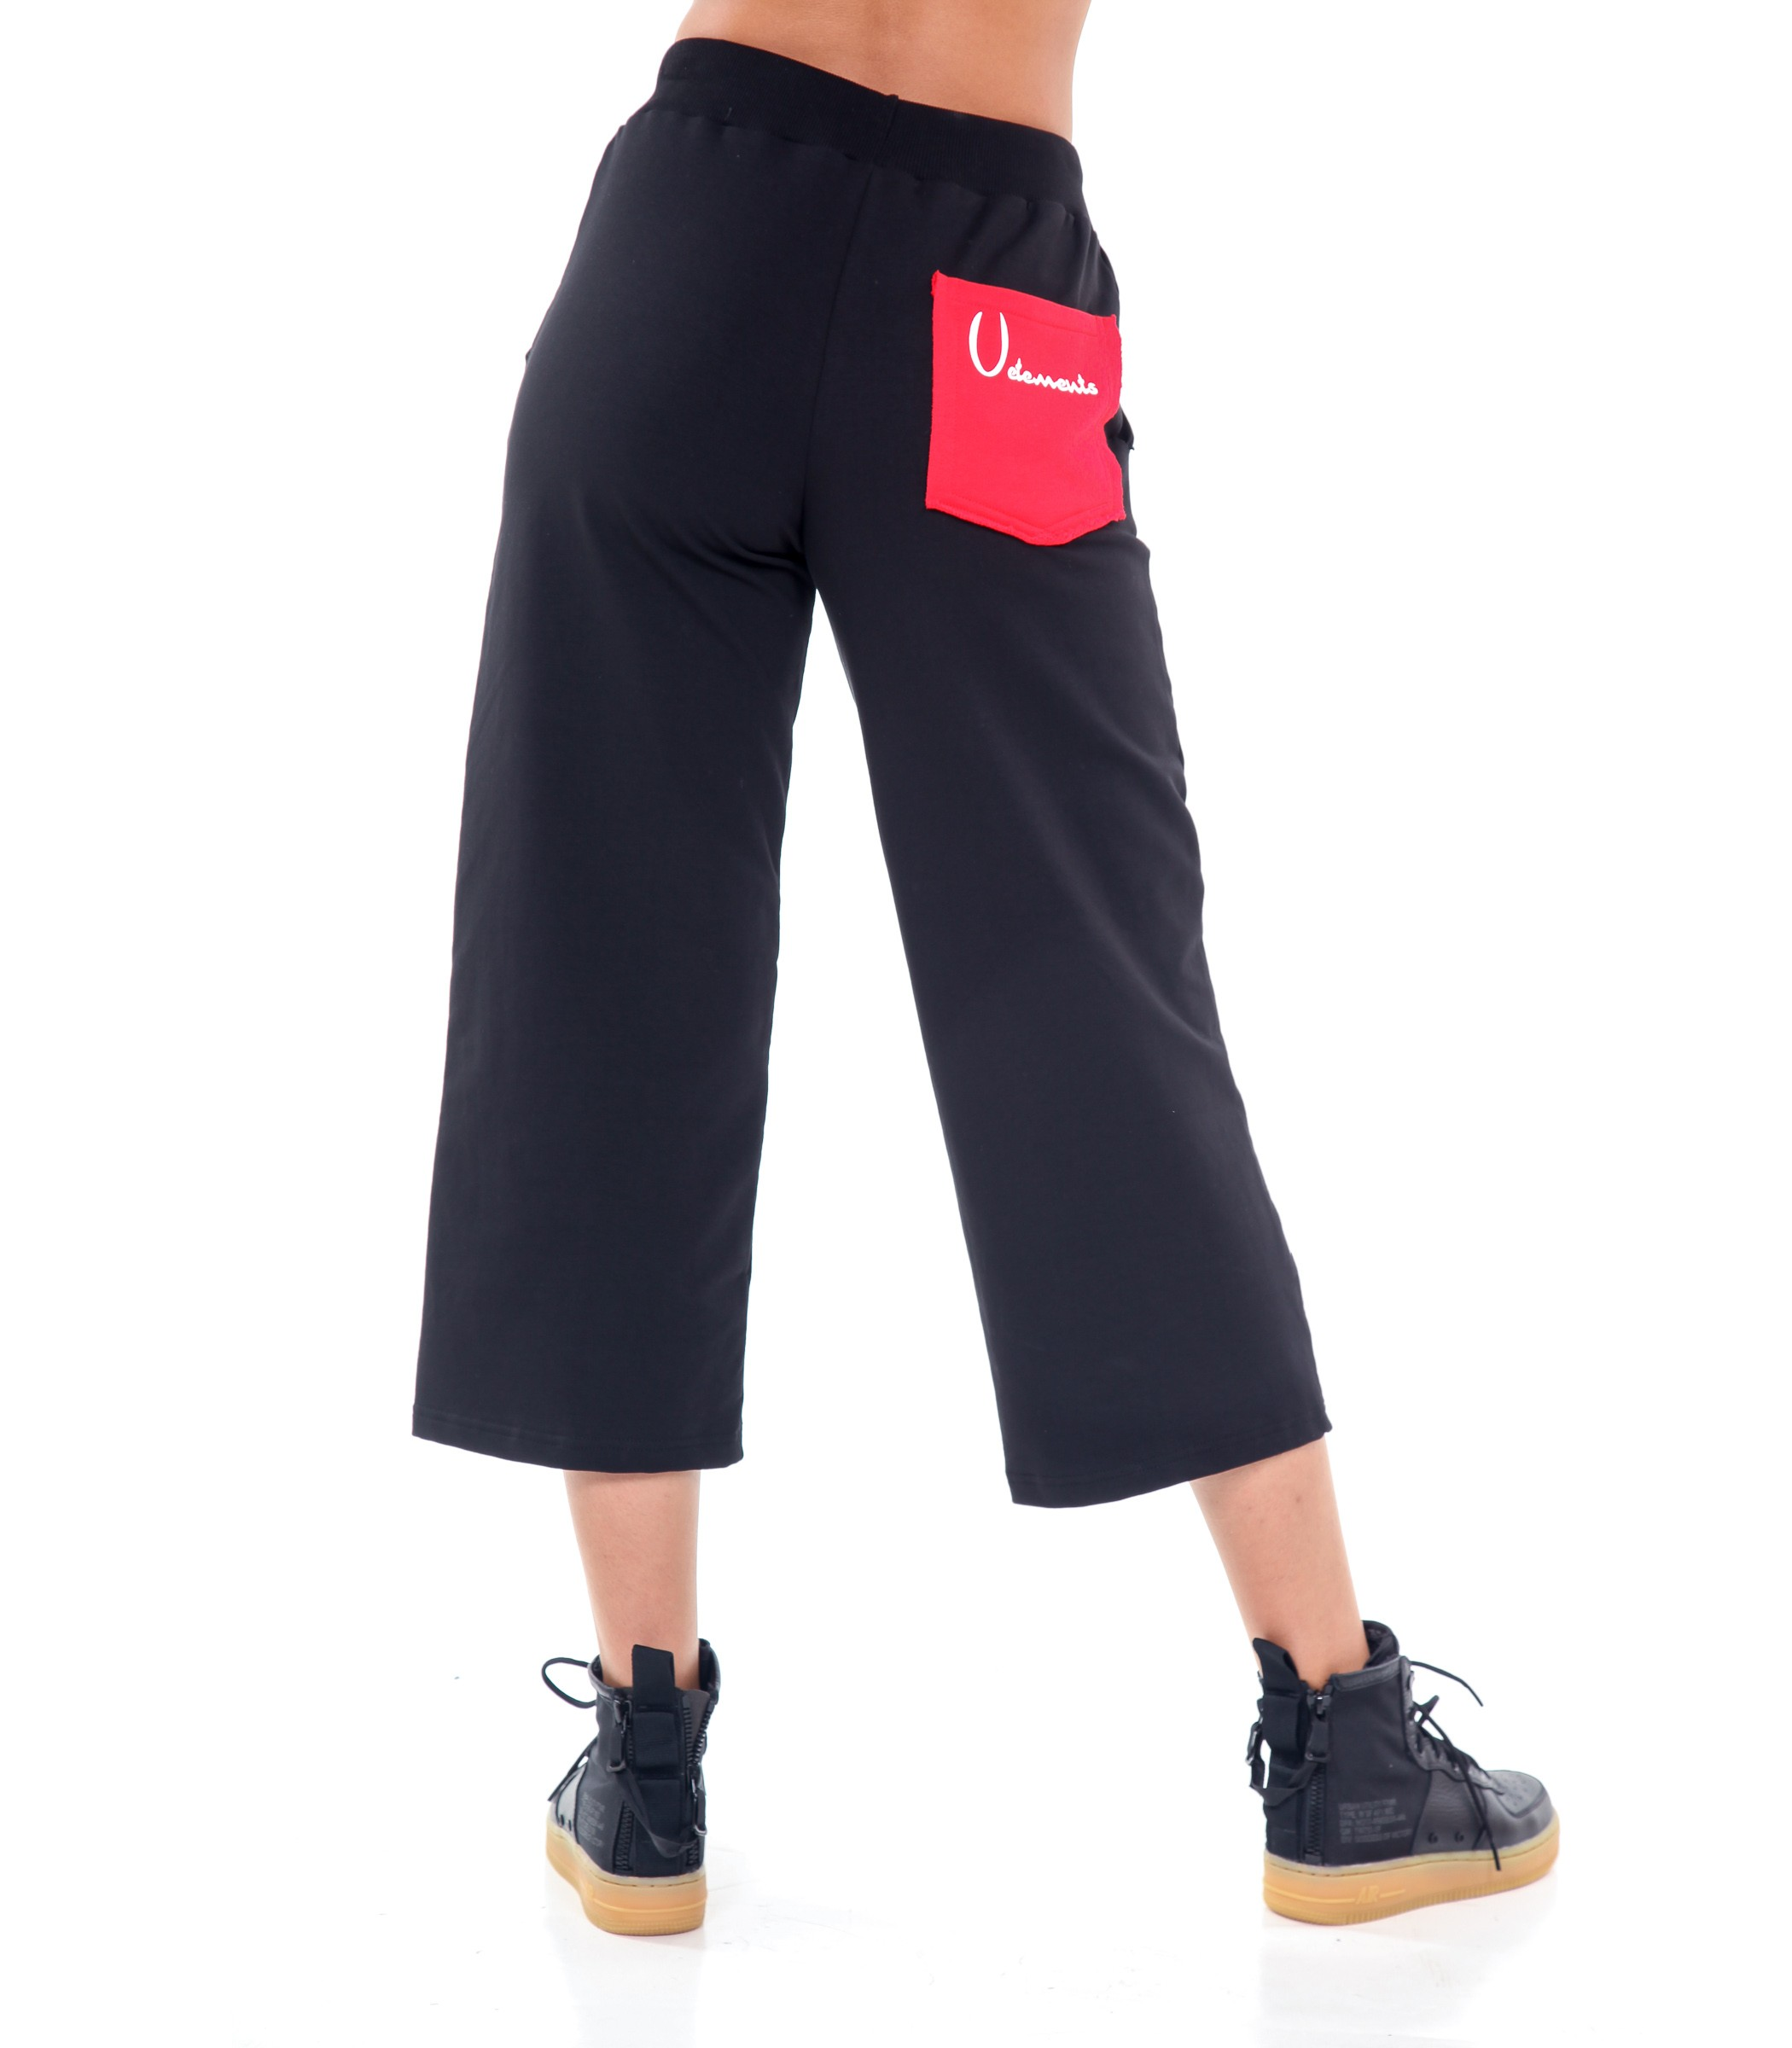 Donna Tasche 4 Pantaloni 3 Con lJ3FKcT1